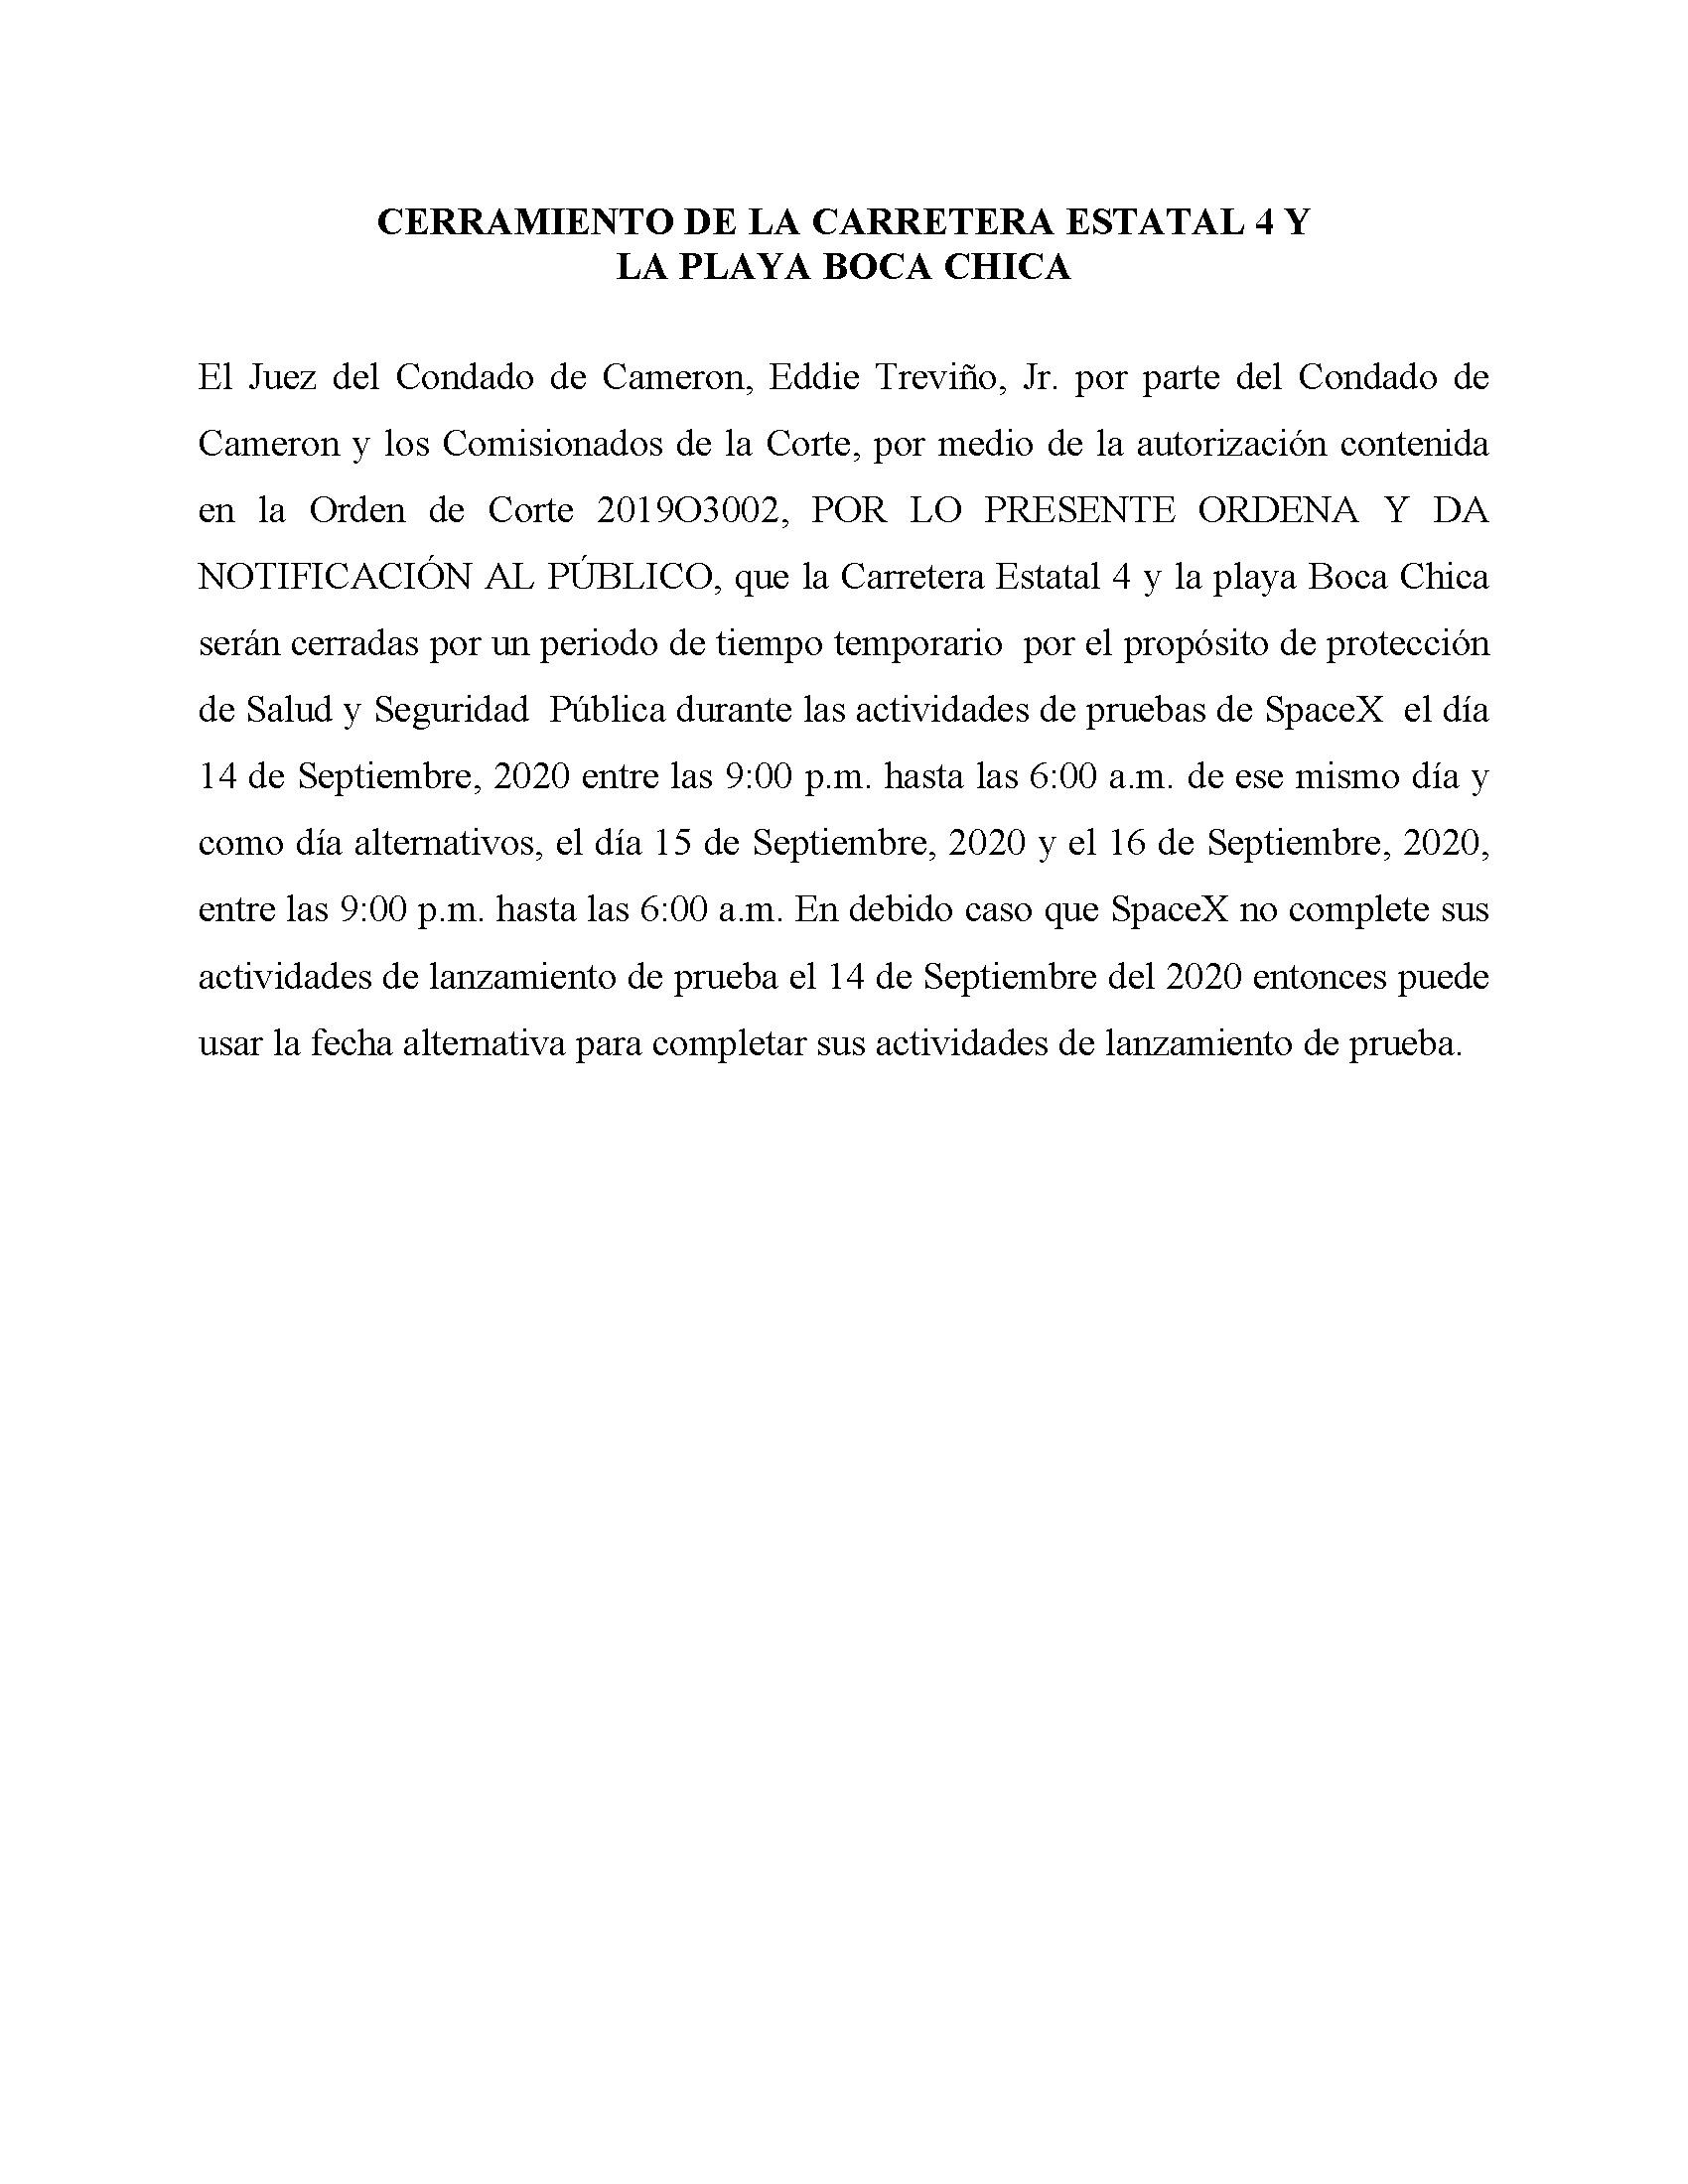 ORDER.CLOSURE OF HIGHWAY 4 Y LA PLAYA BOCA CHICA.SPANISH.9.14.20